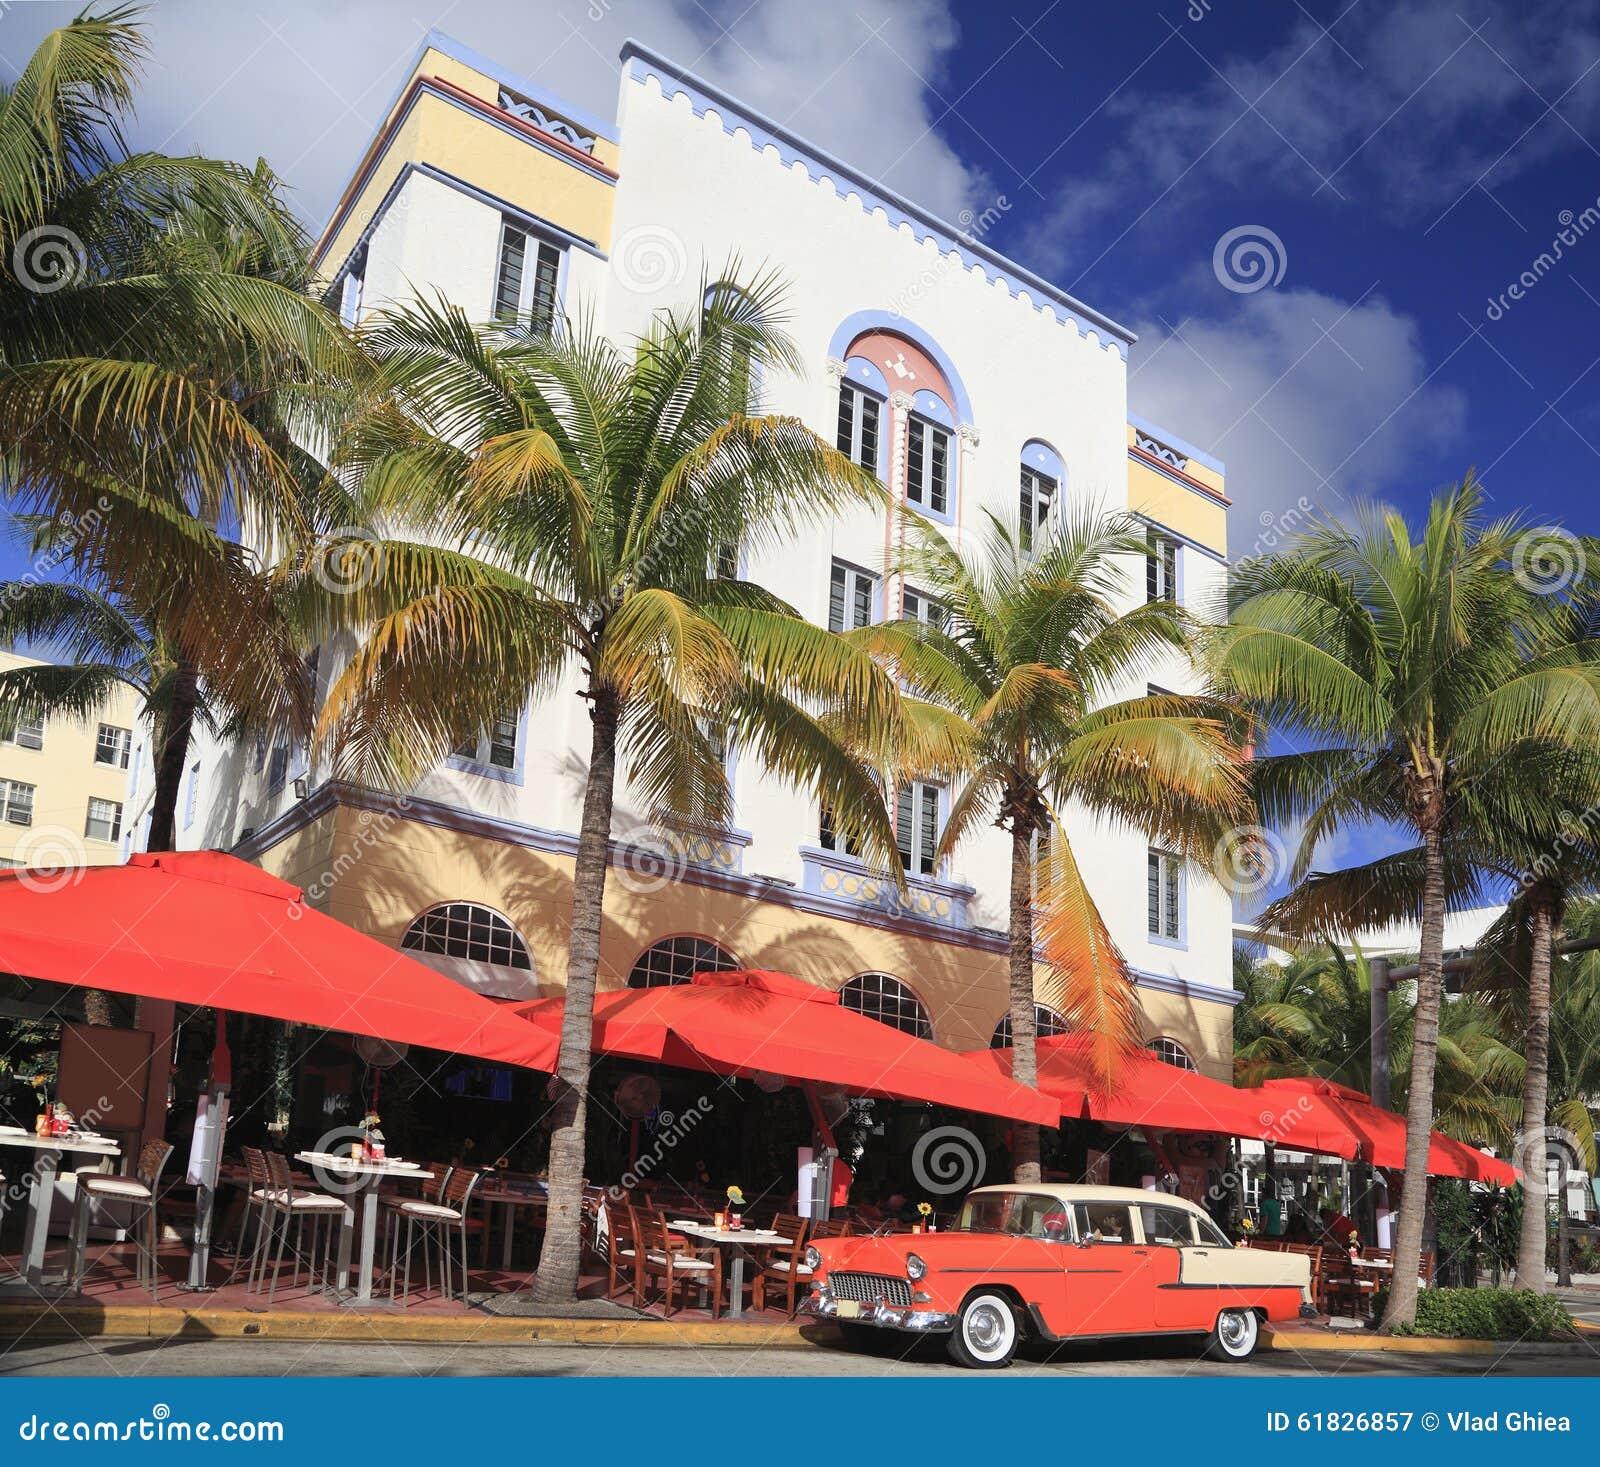 Old Car And Restaurants On Ocean Drive Miami Beach Stock